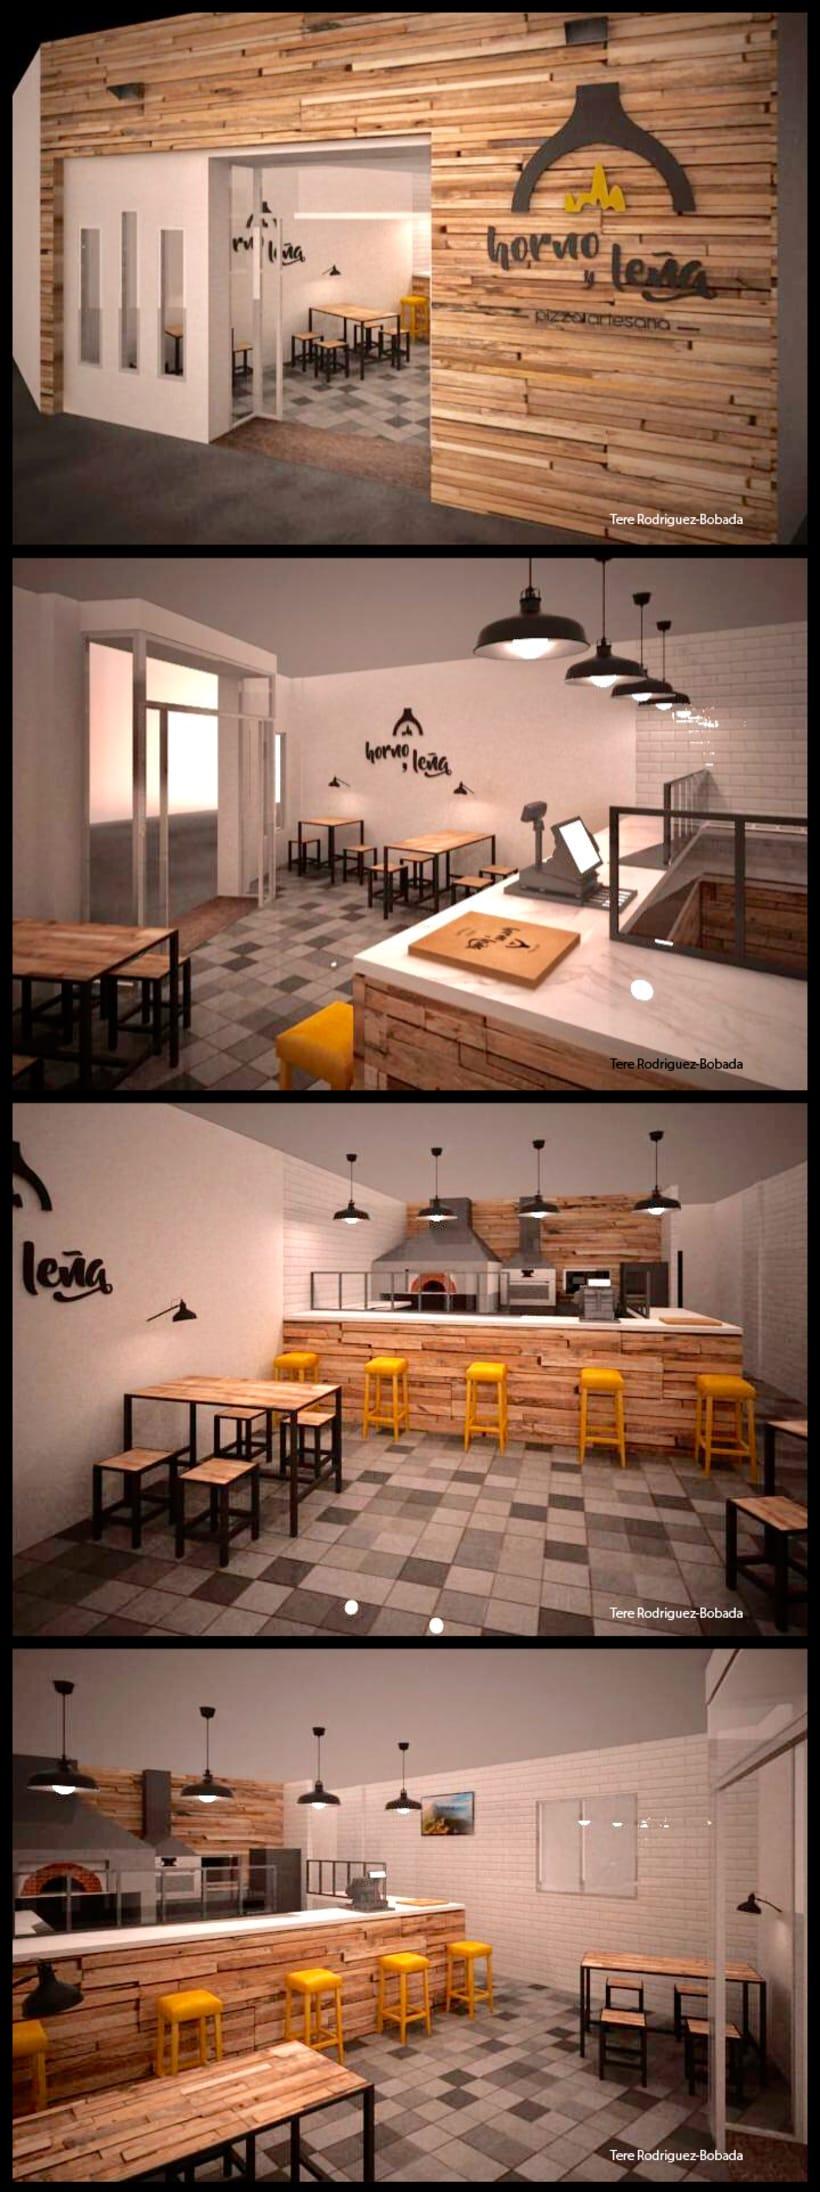 Pizzeria Horno y Leña 3